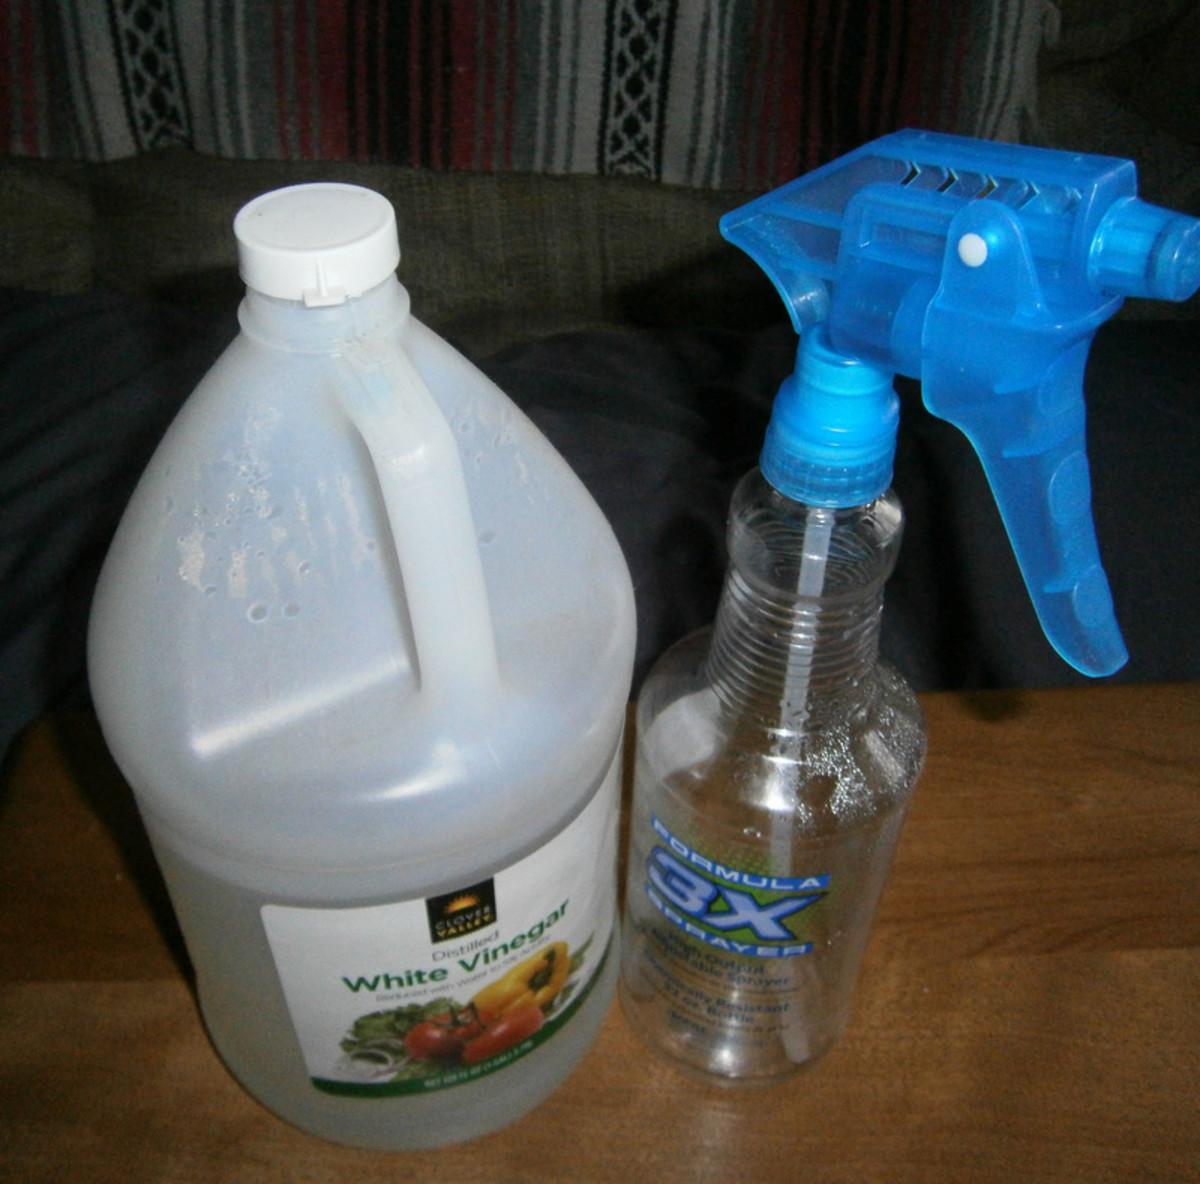 Make a vinegar rinse for the Shih Tzu's bath.